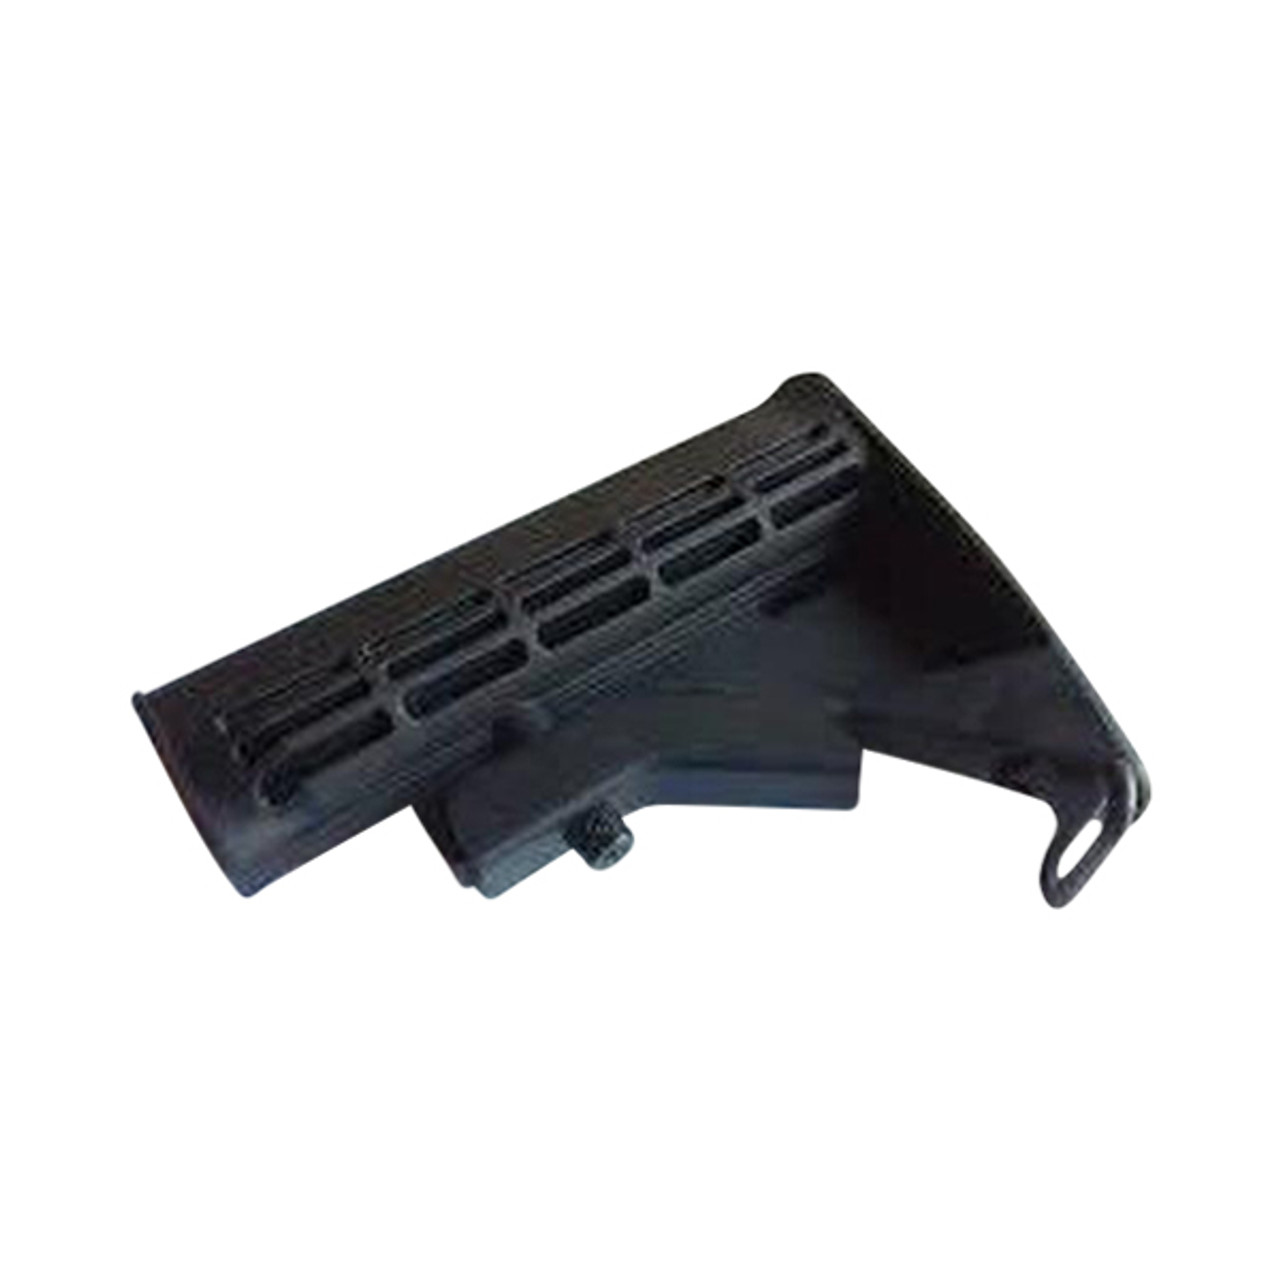 Colt M4 waffle stock, DOD P&S mil-spec